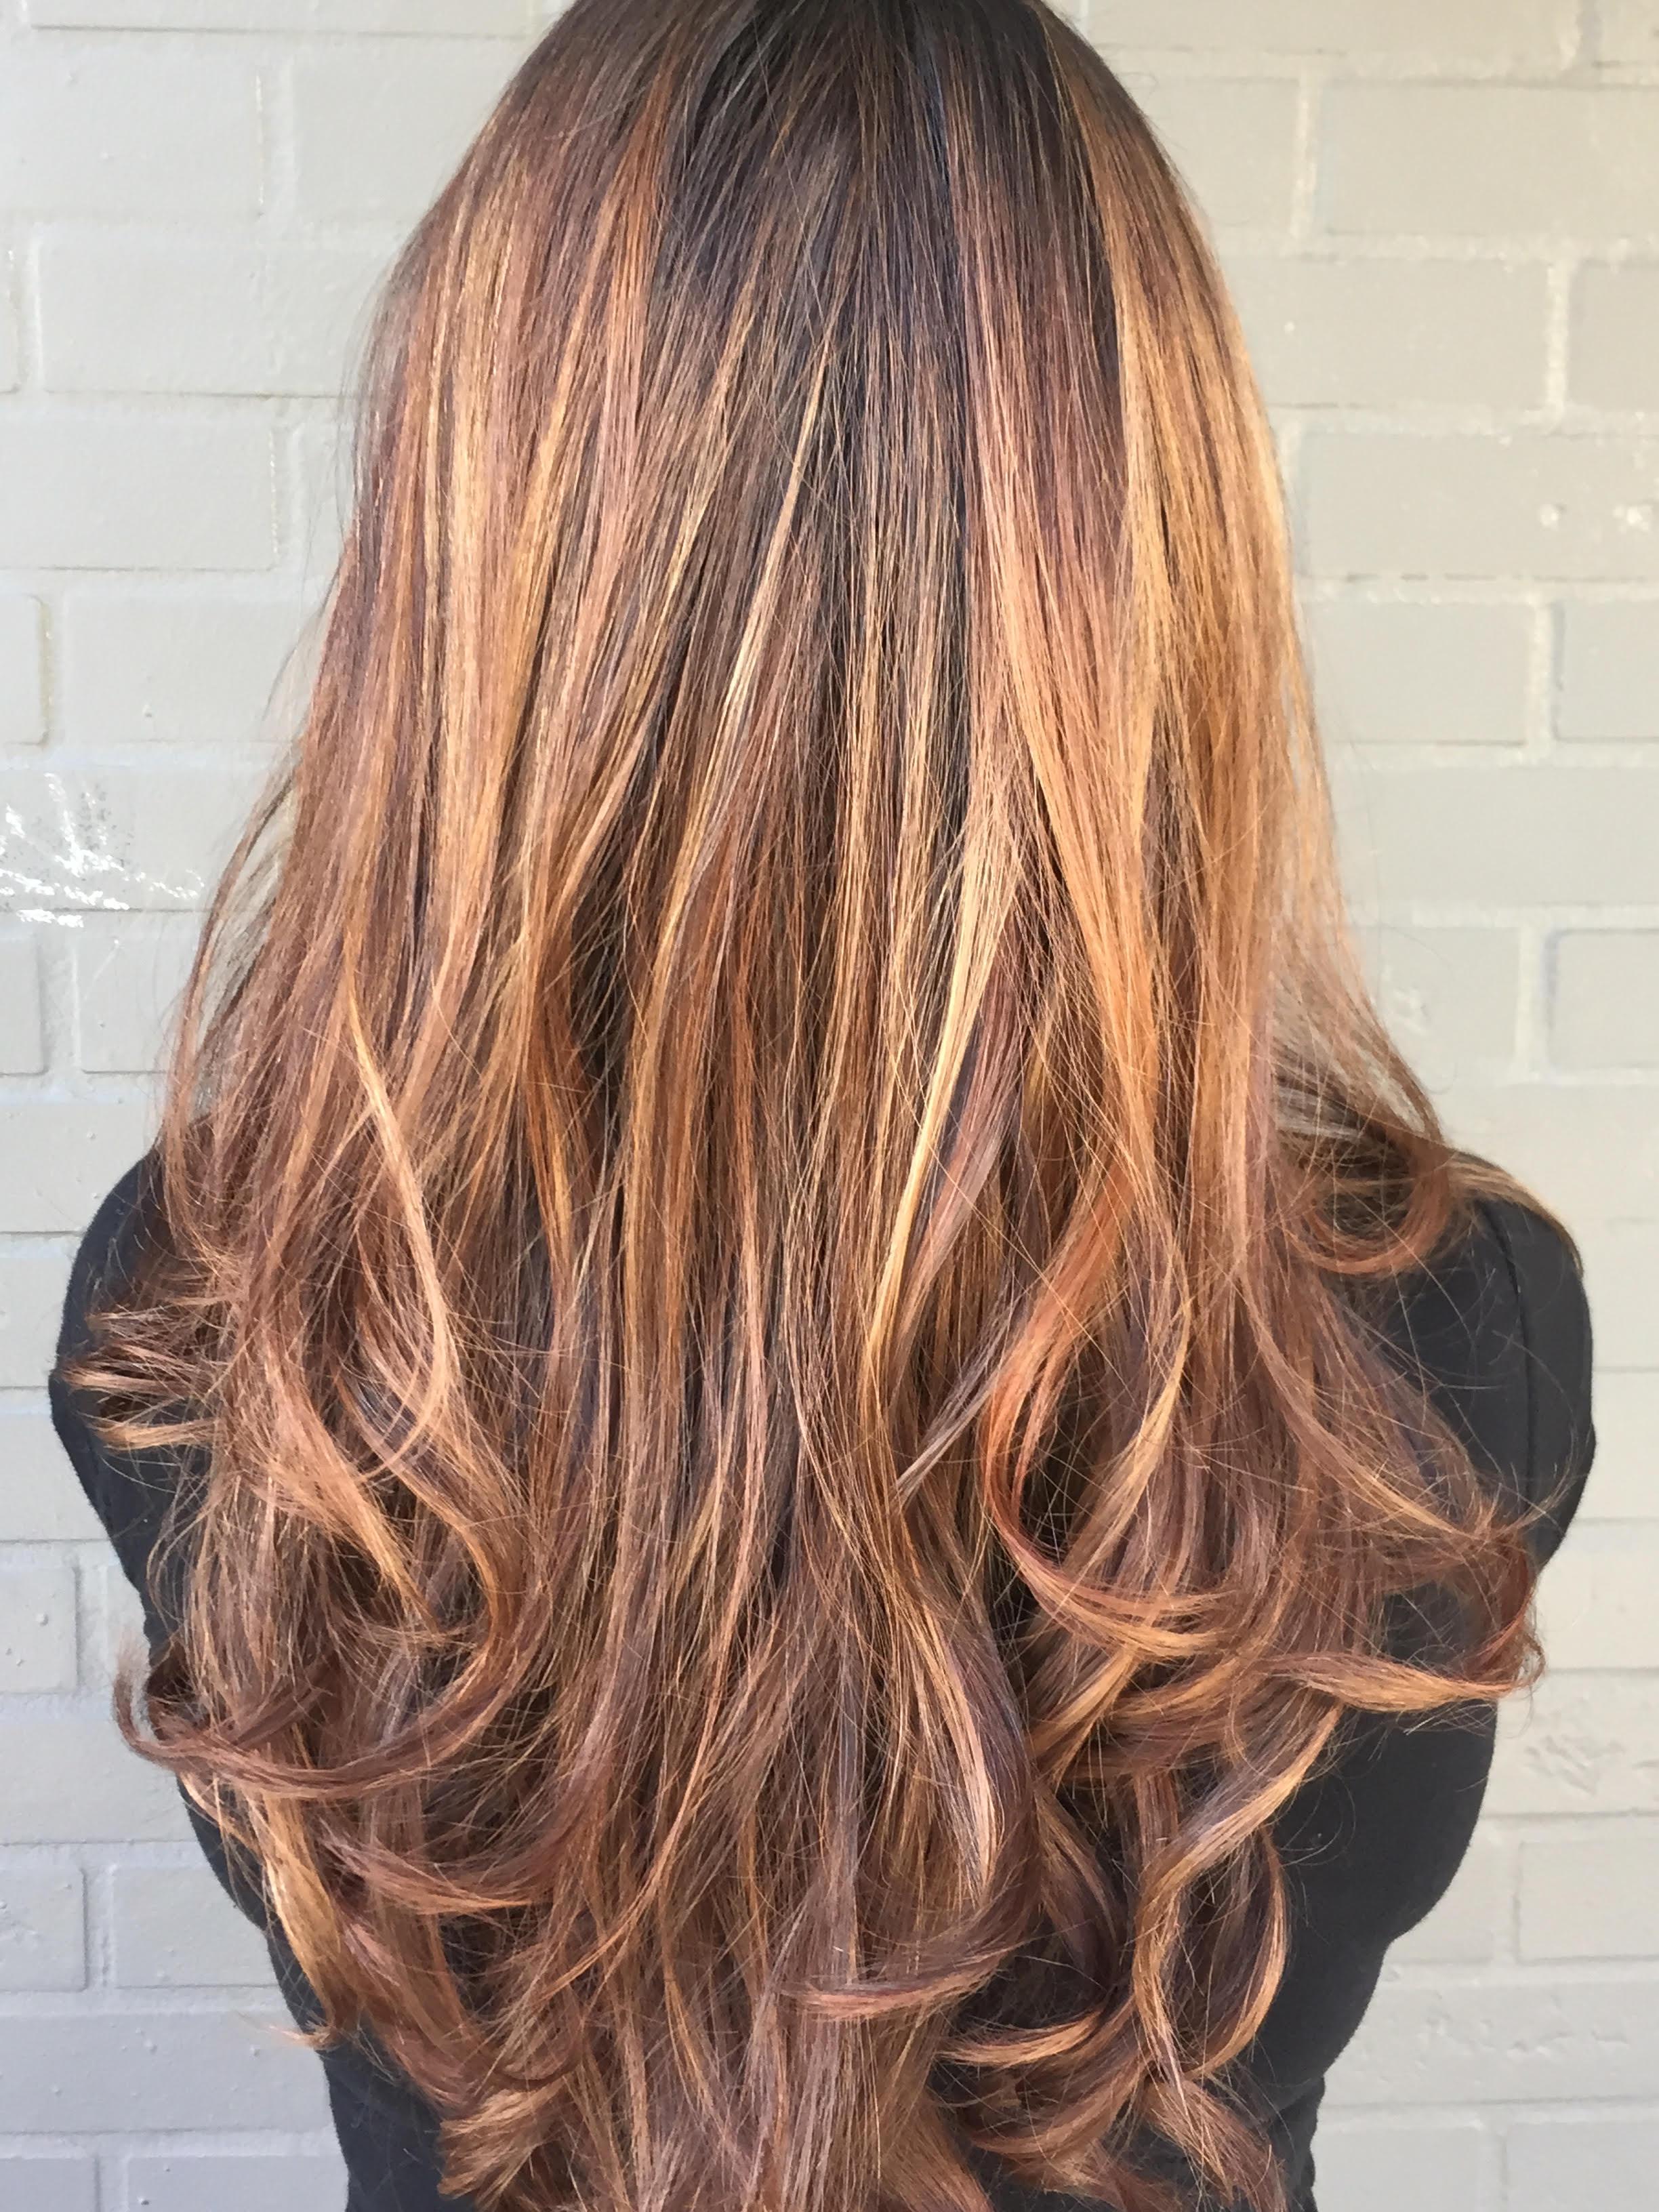 NYE Sunset dress & hair Inspiration